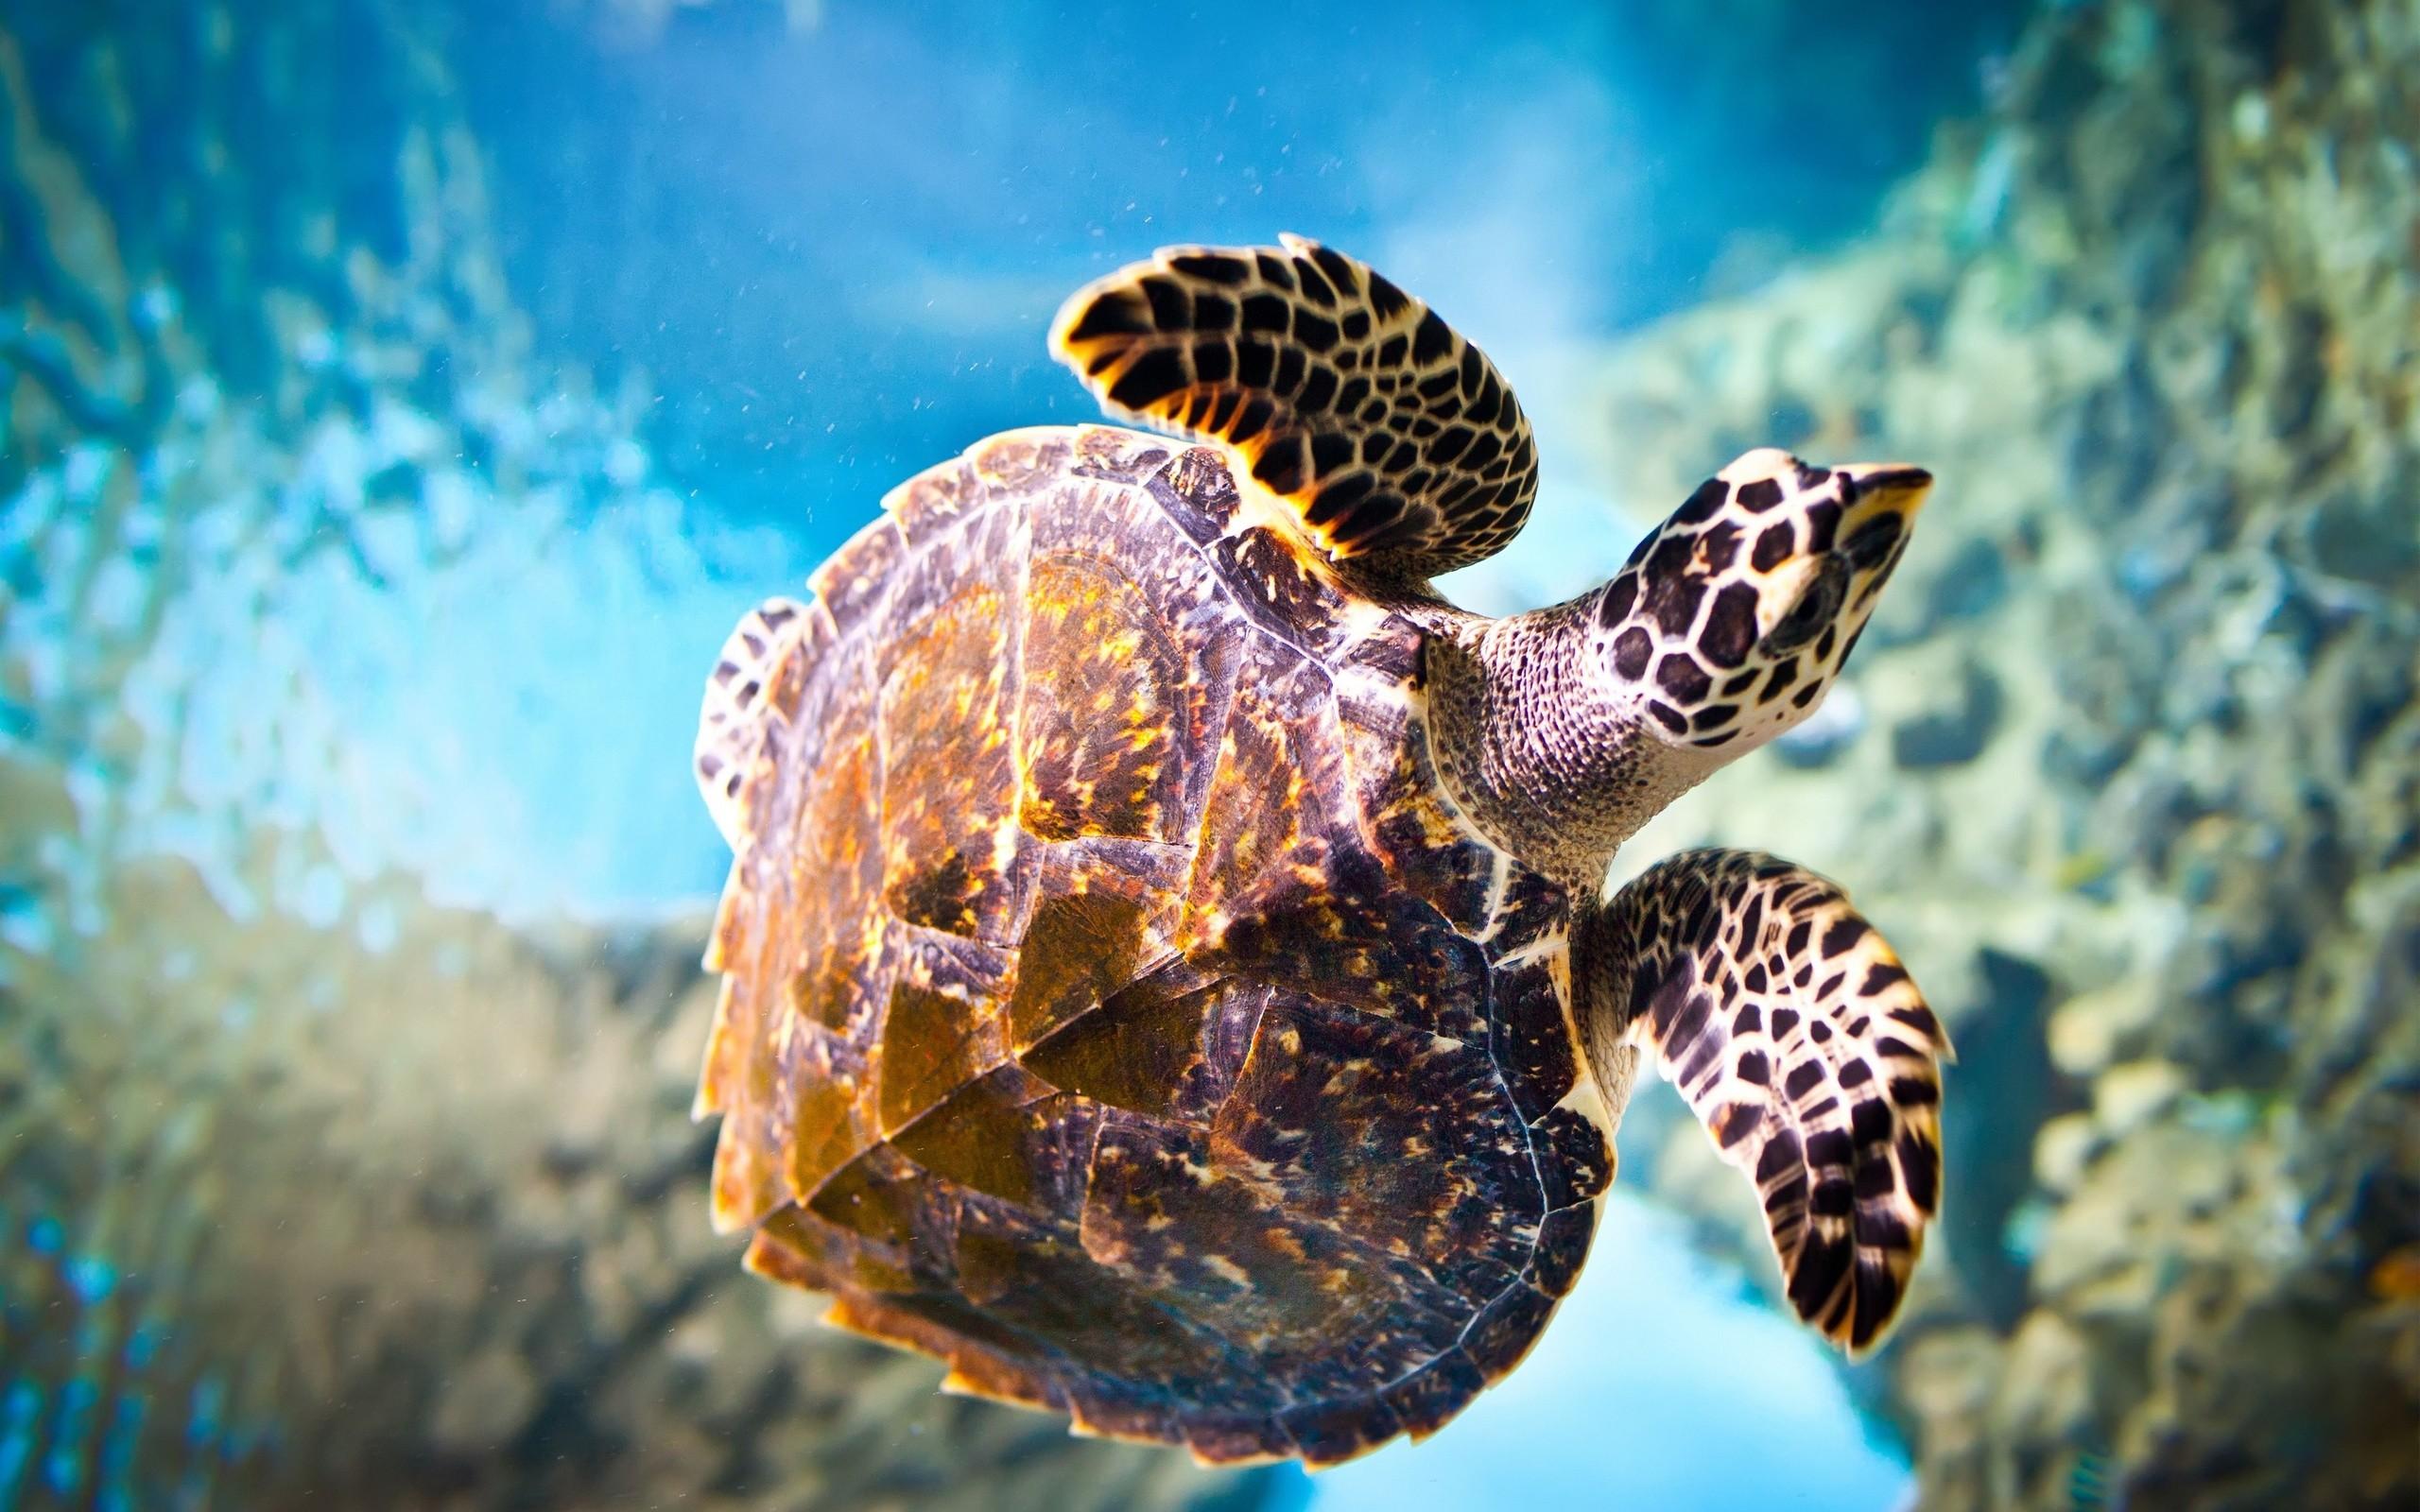 Turtle, Close Up, Underwater, Animal wallpaper thumb